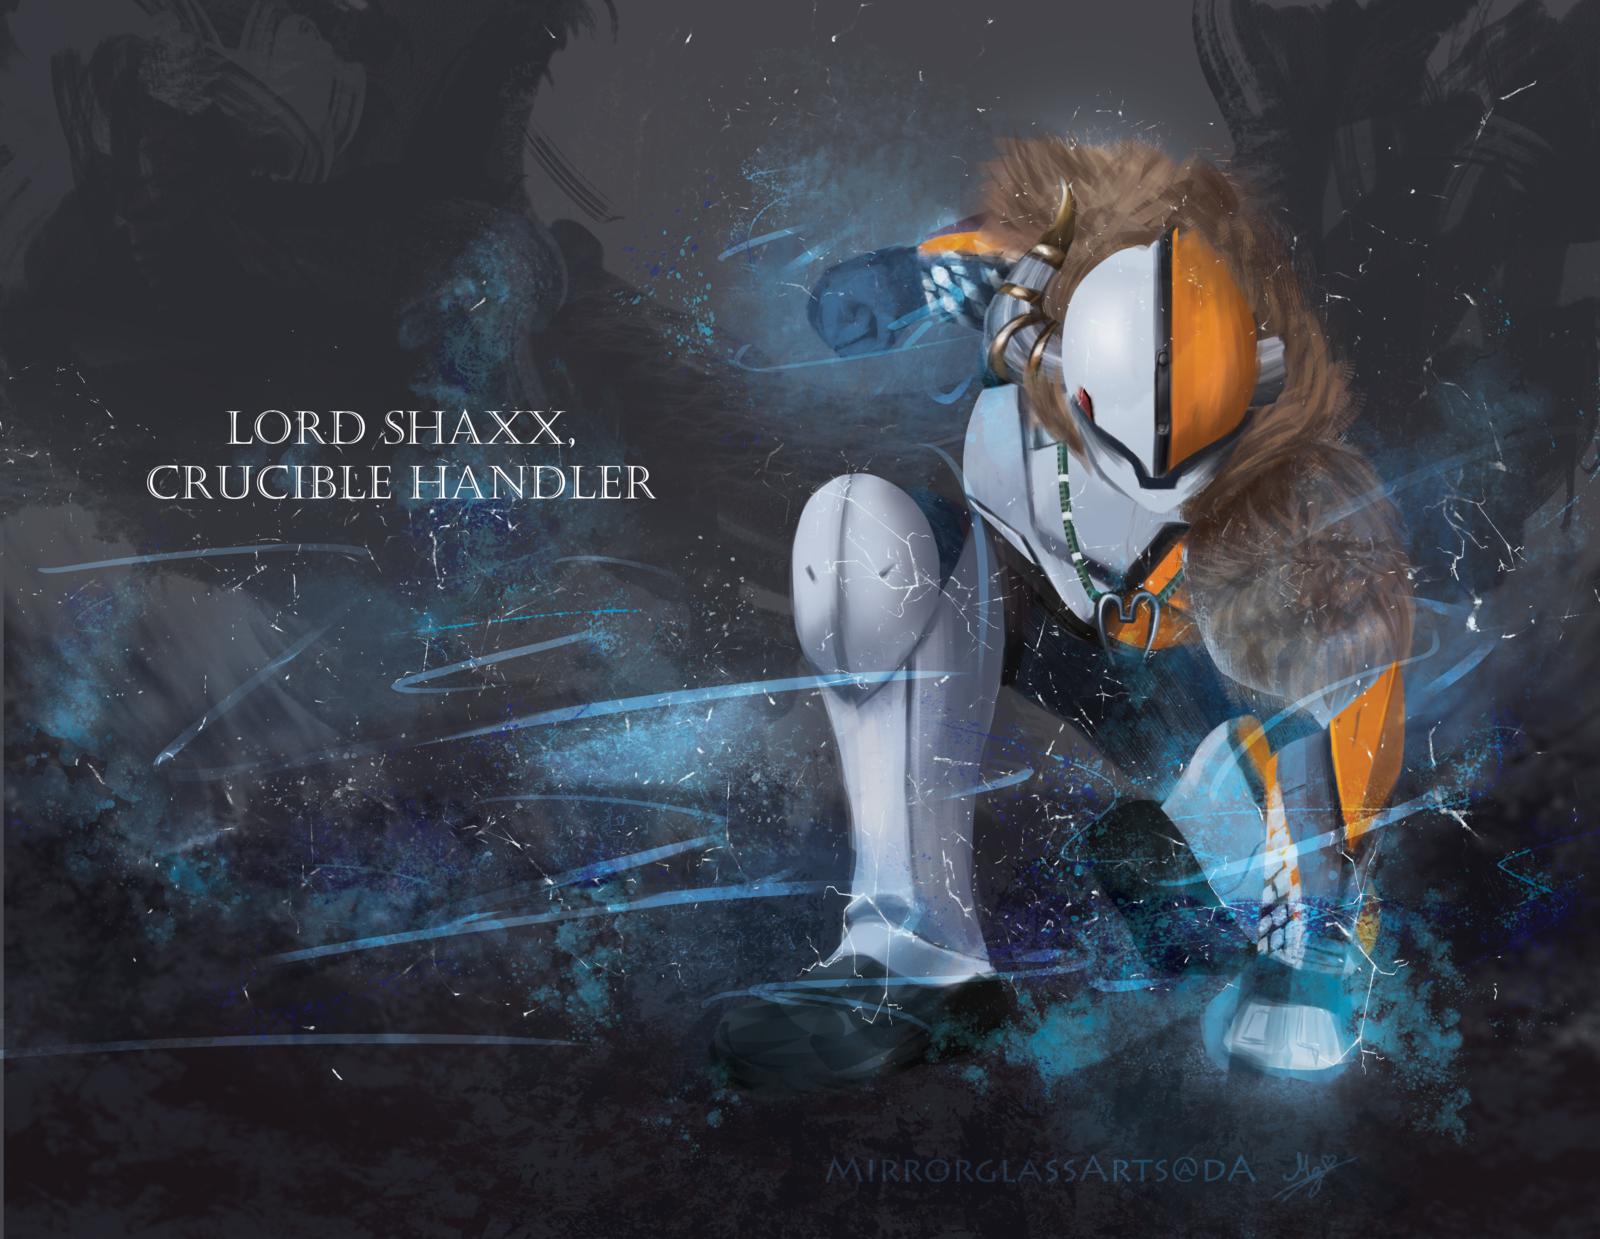 Lord Shaxx Destiny Game Destiny Comic Destiny